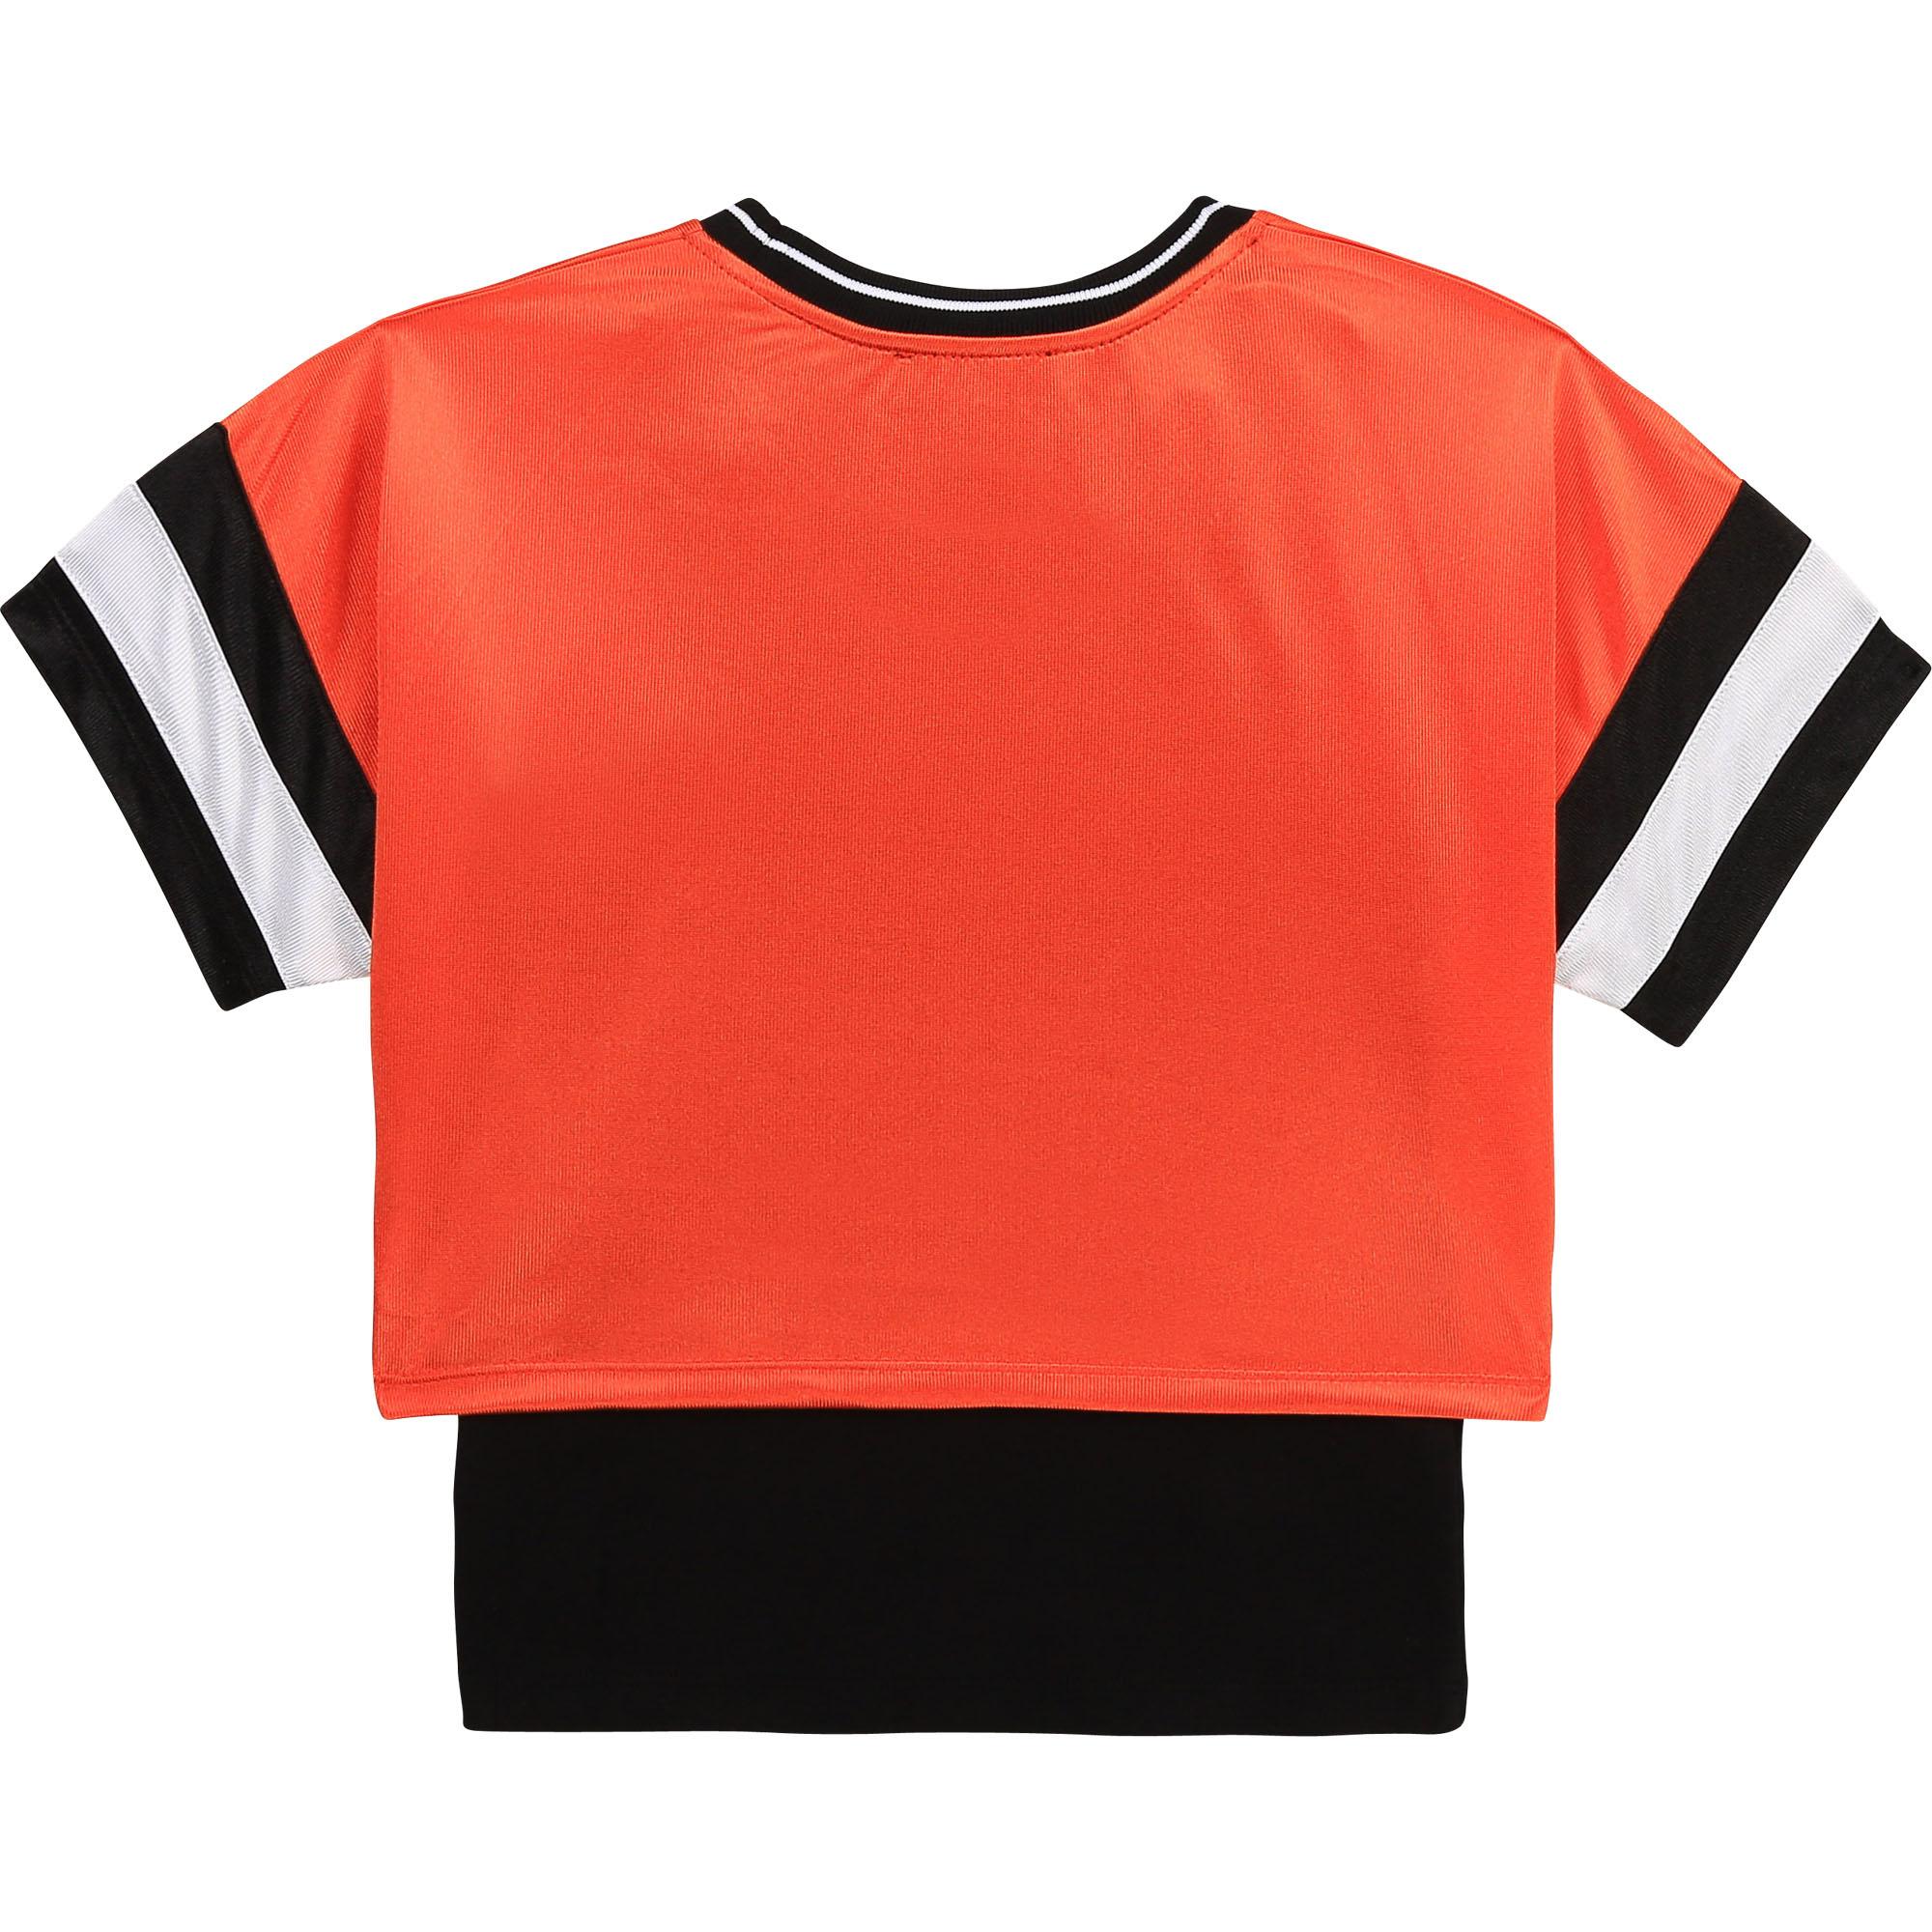 DKNY t-shirt + top jersey brillant-2